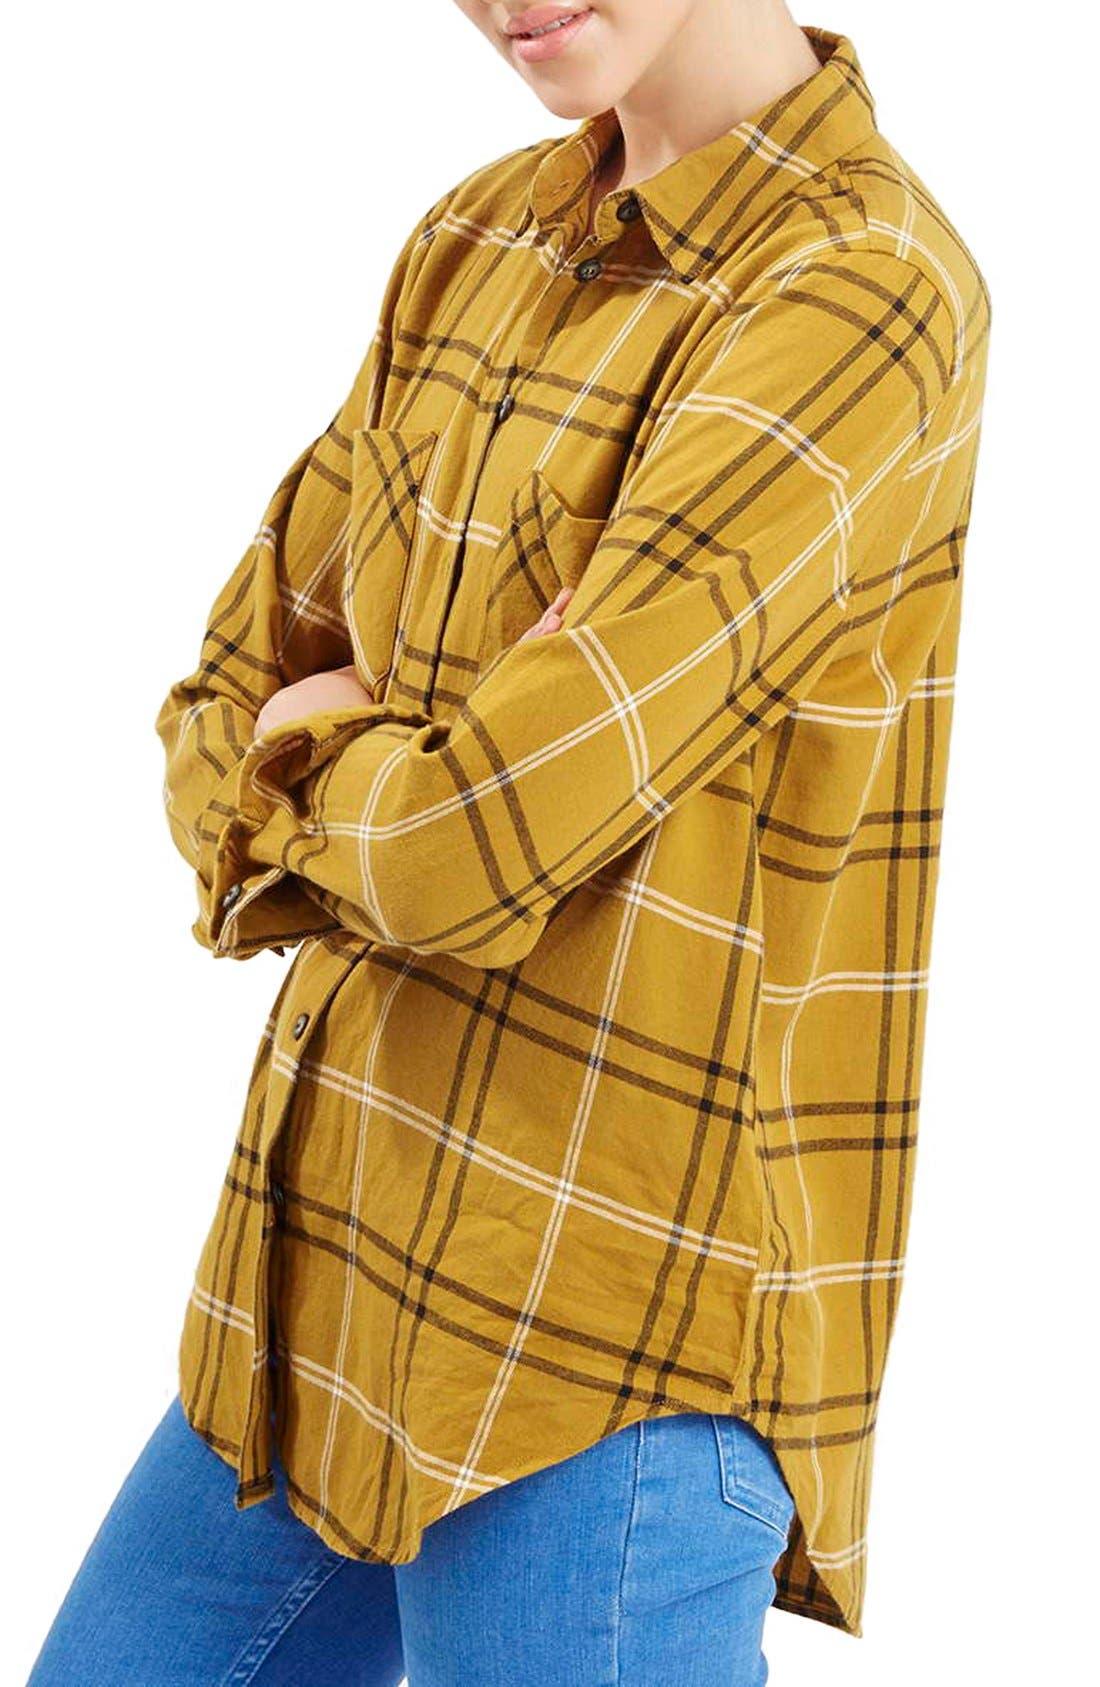 TOPSHOP, 'Billie' Check Button FrontBoyfriend Shirt, Main thumbnail 1, color, 701